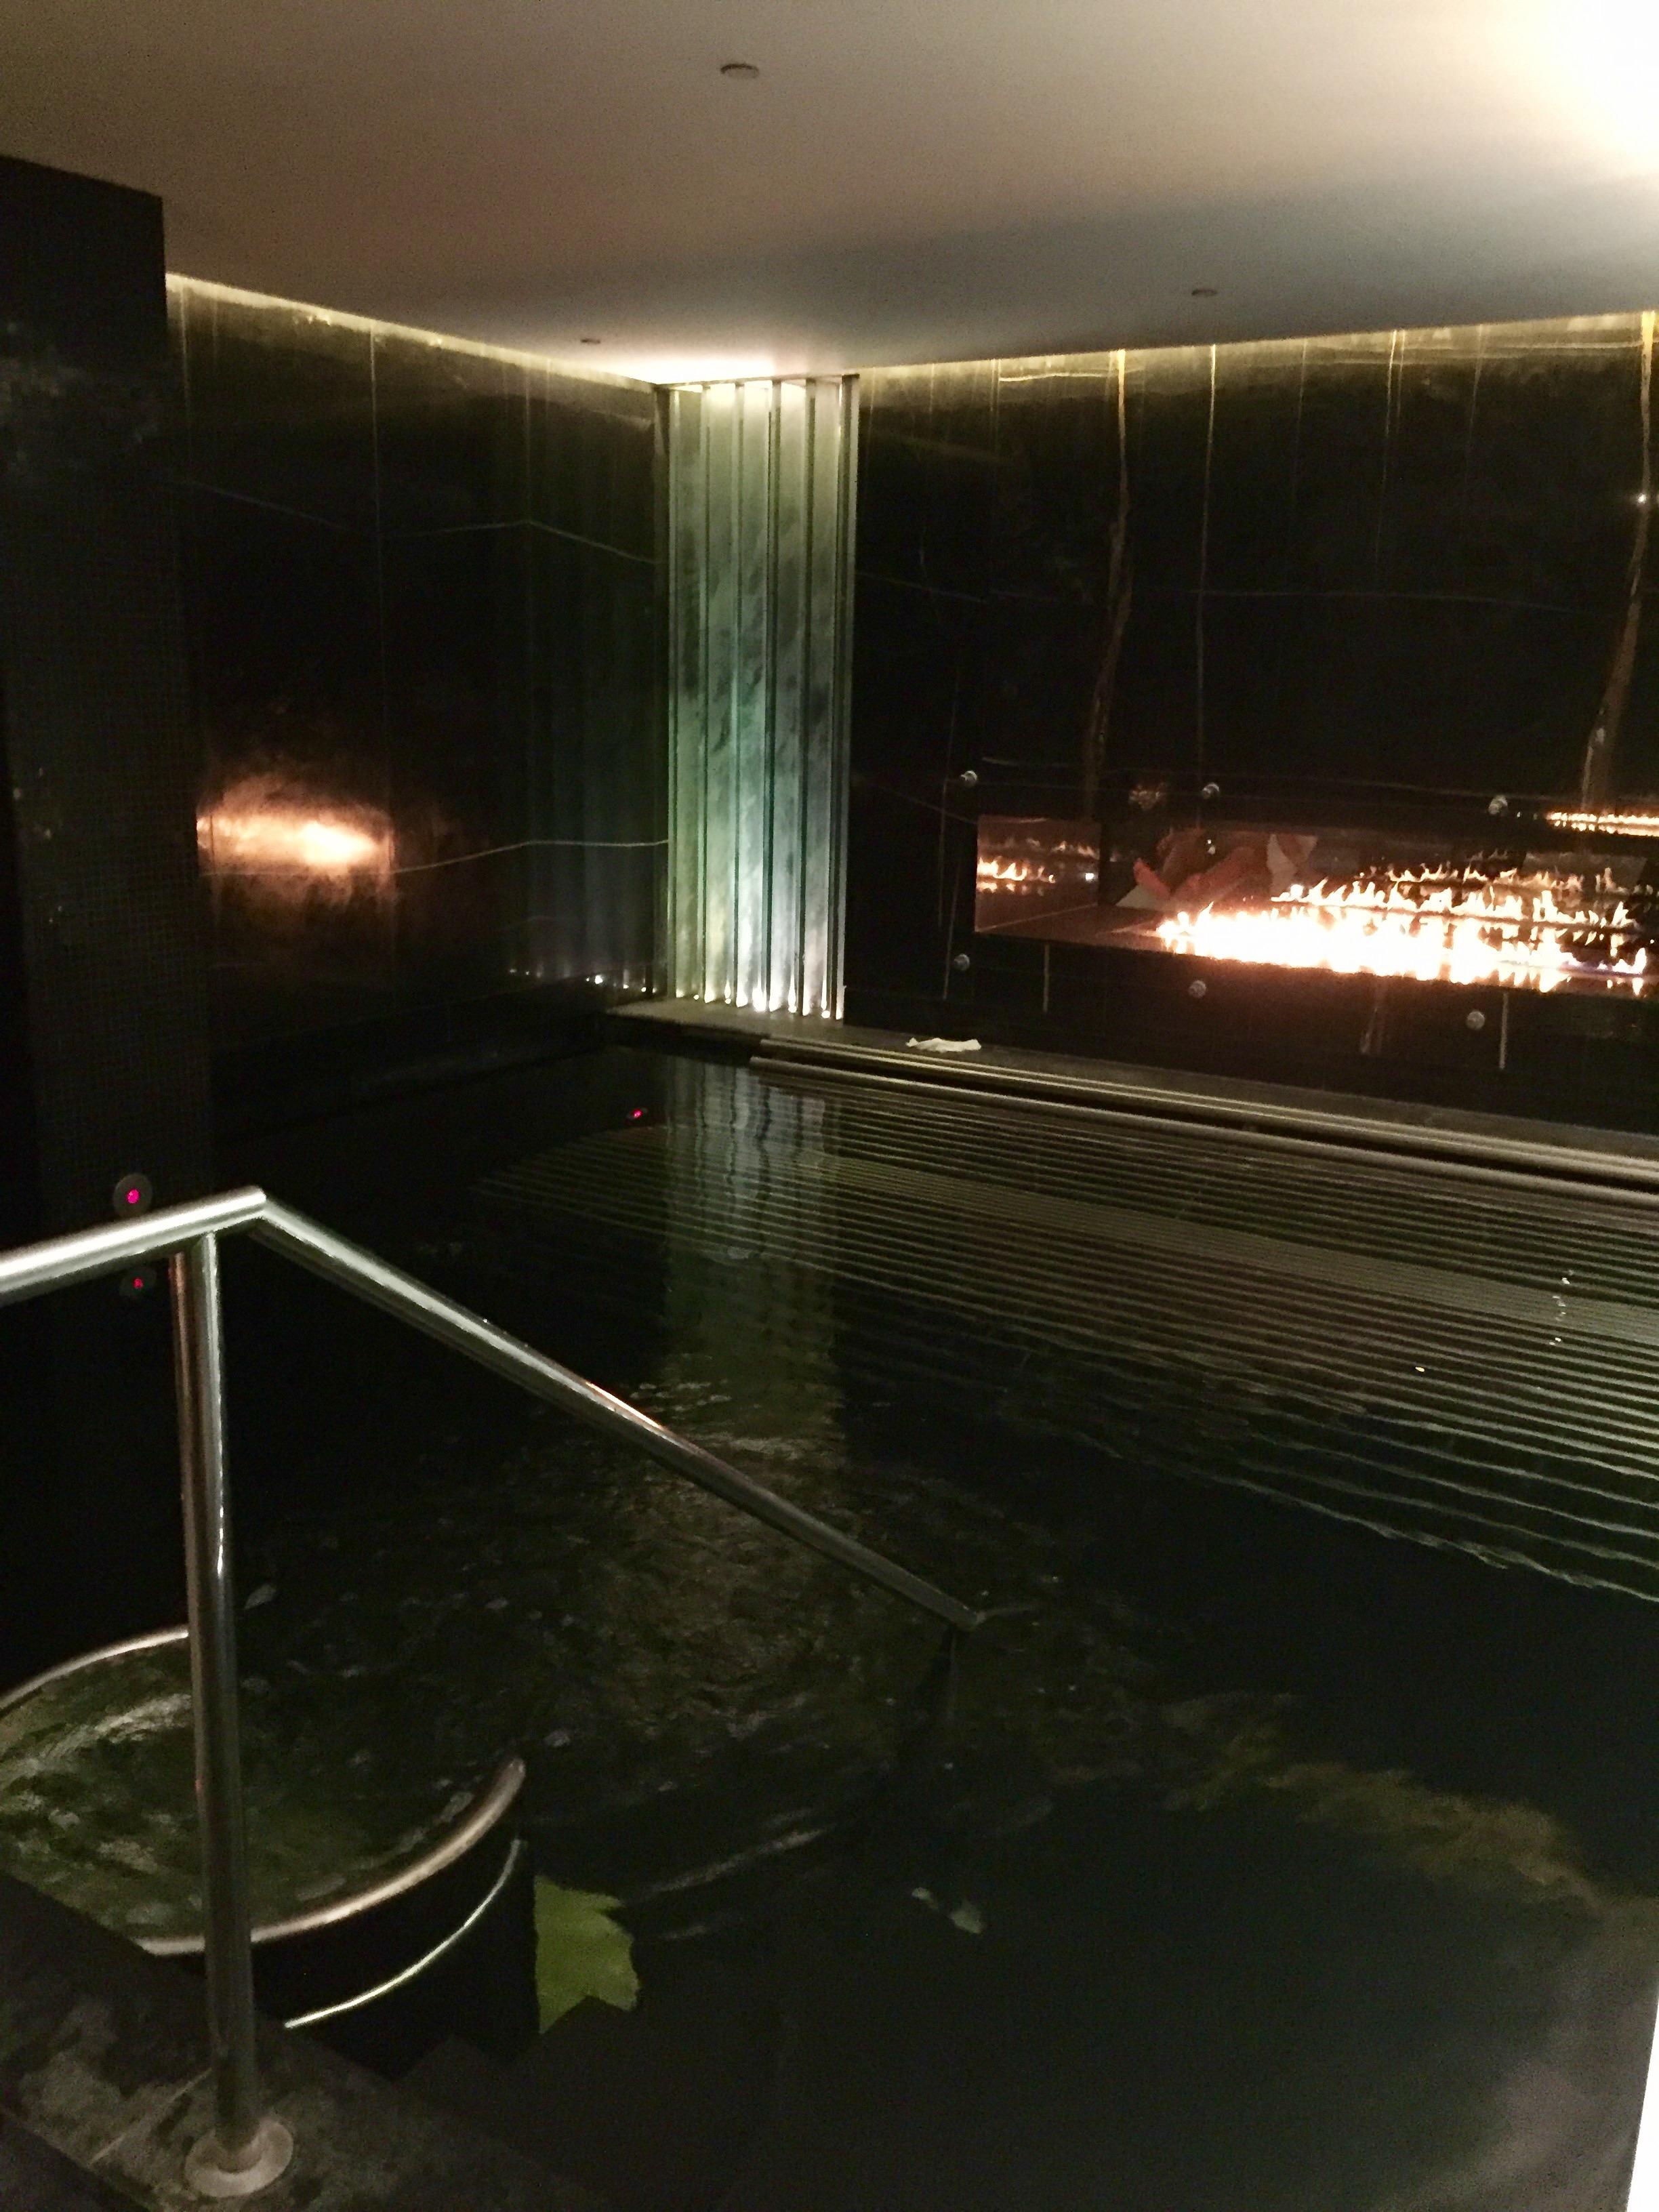 Corinthia Hotel London offers